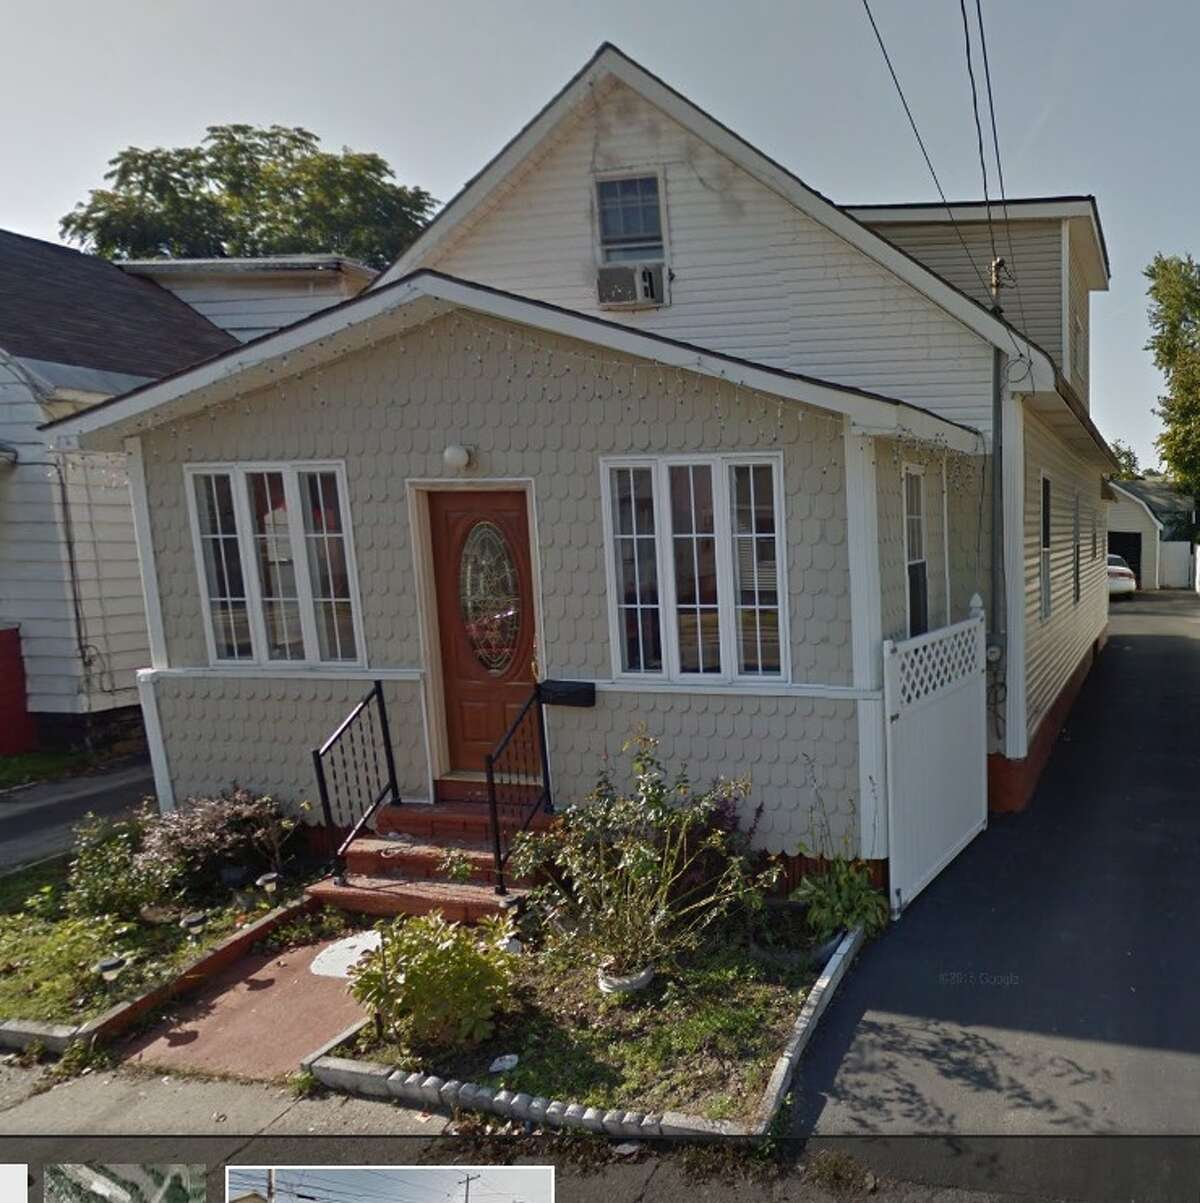 273 Altamont Ave., Schenectady, $36,000 (Realtor.com)